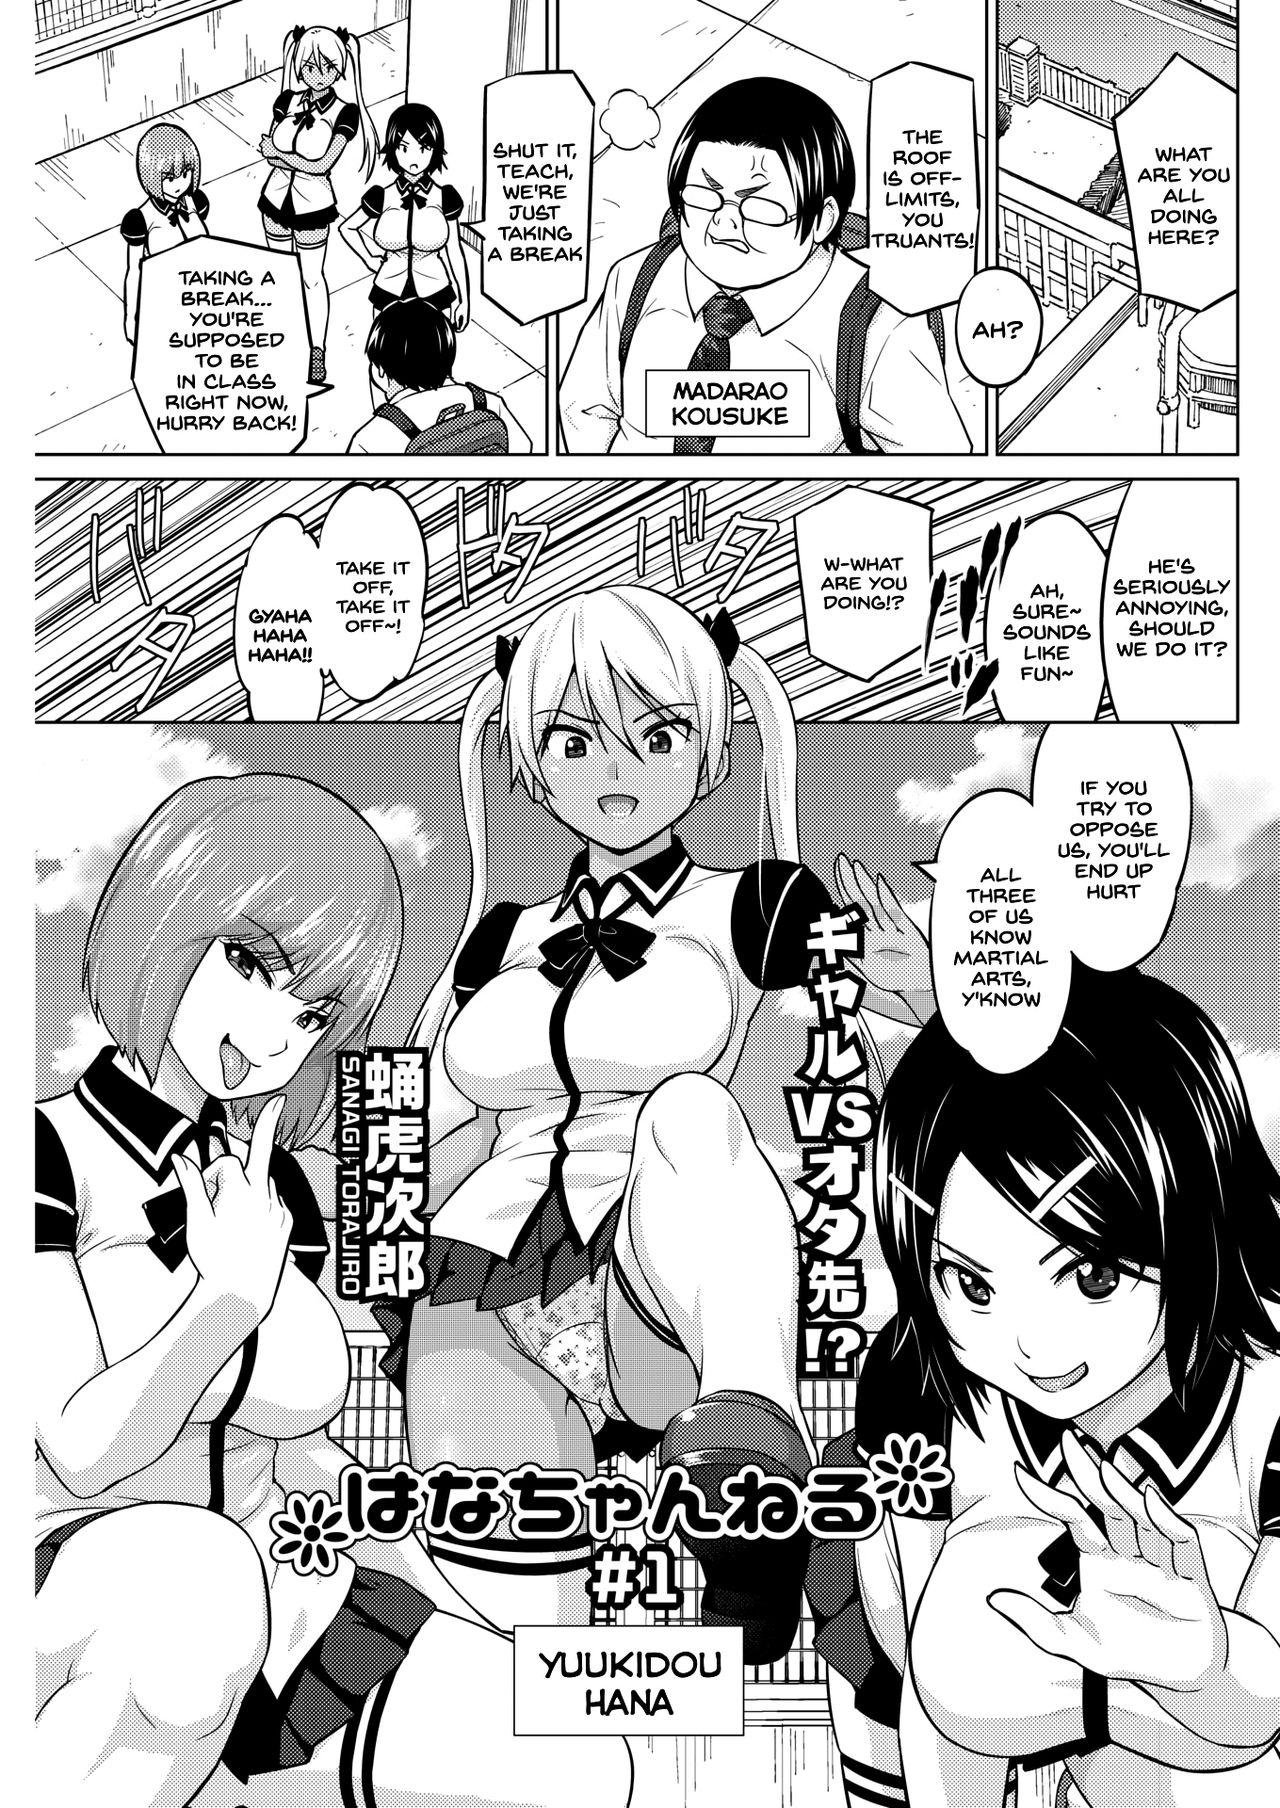 [Sanagi Torajirou] Hana-Channel 01-04 (COMIC HOTMILK) [English] [SDTLs] [Digital] 0